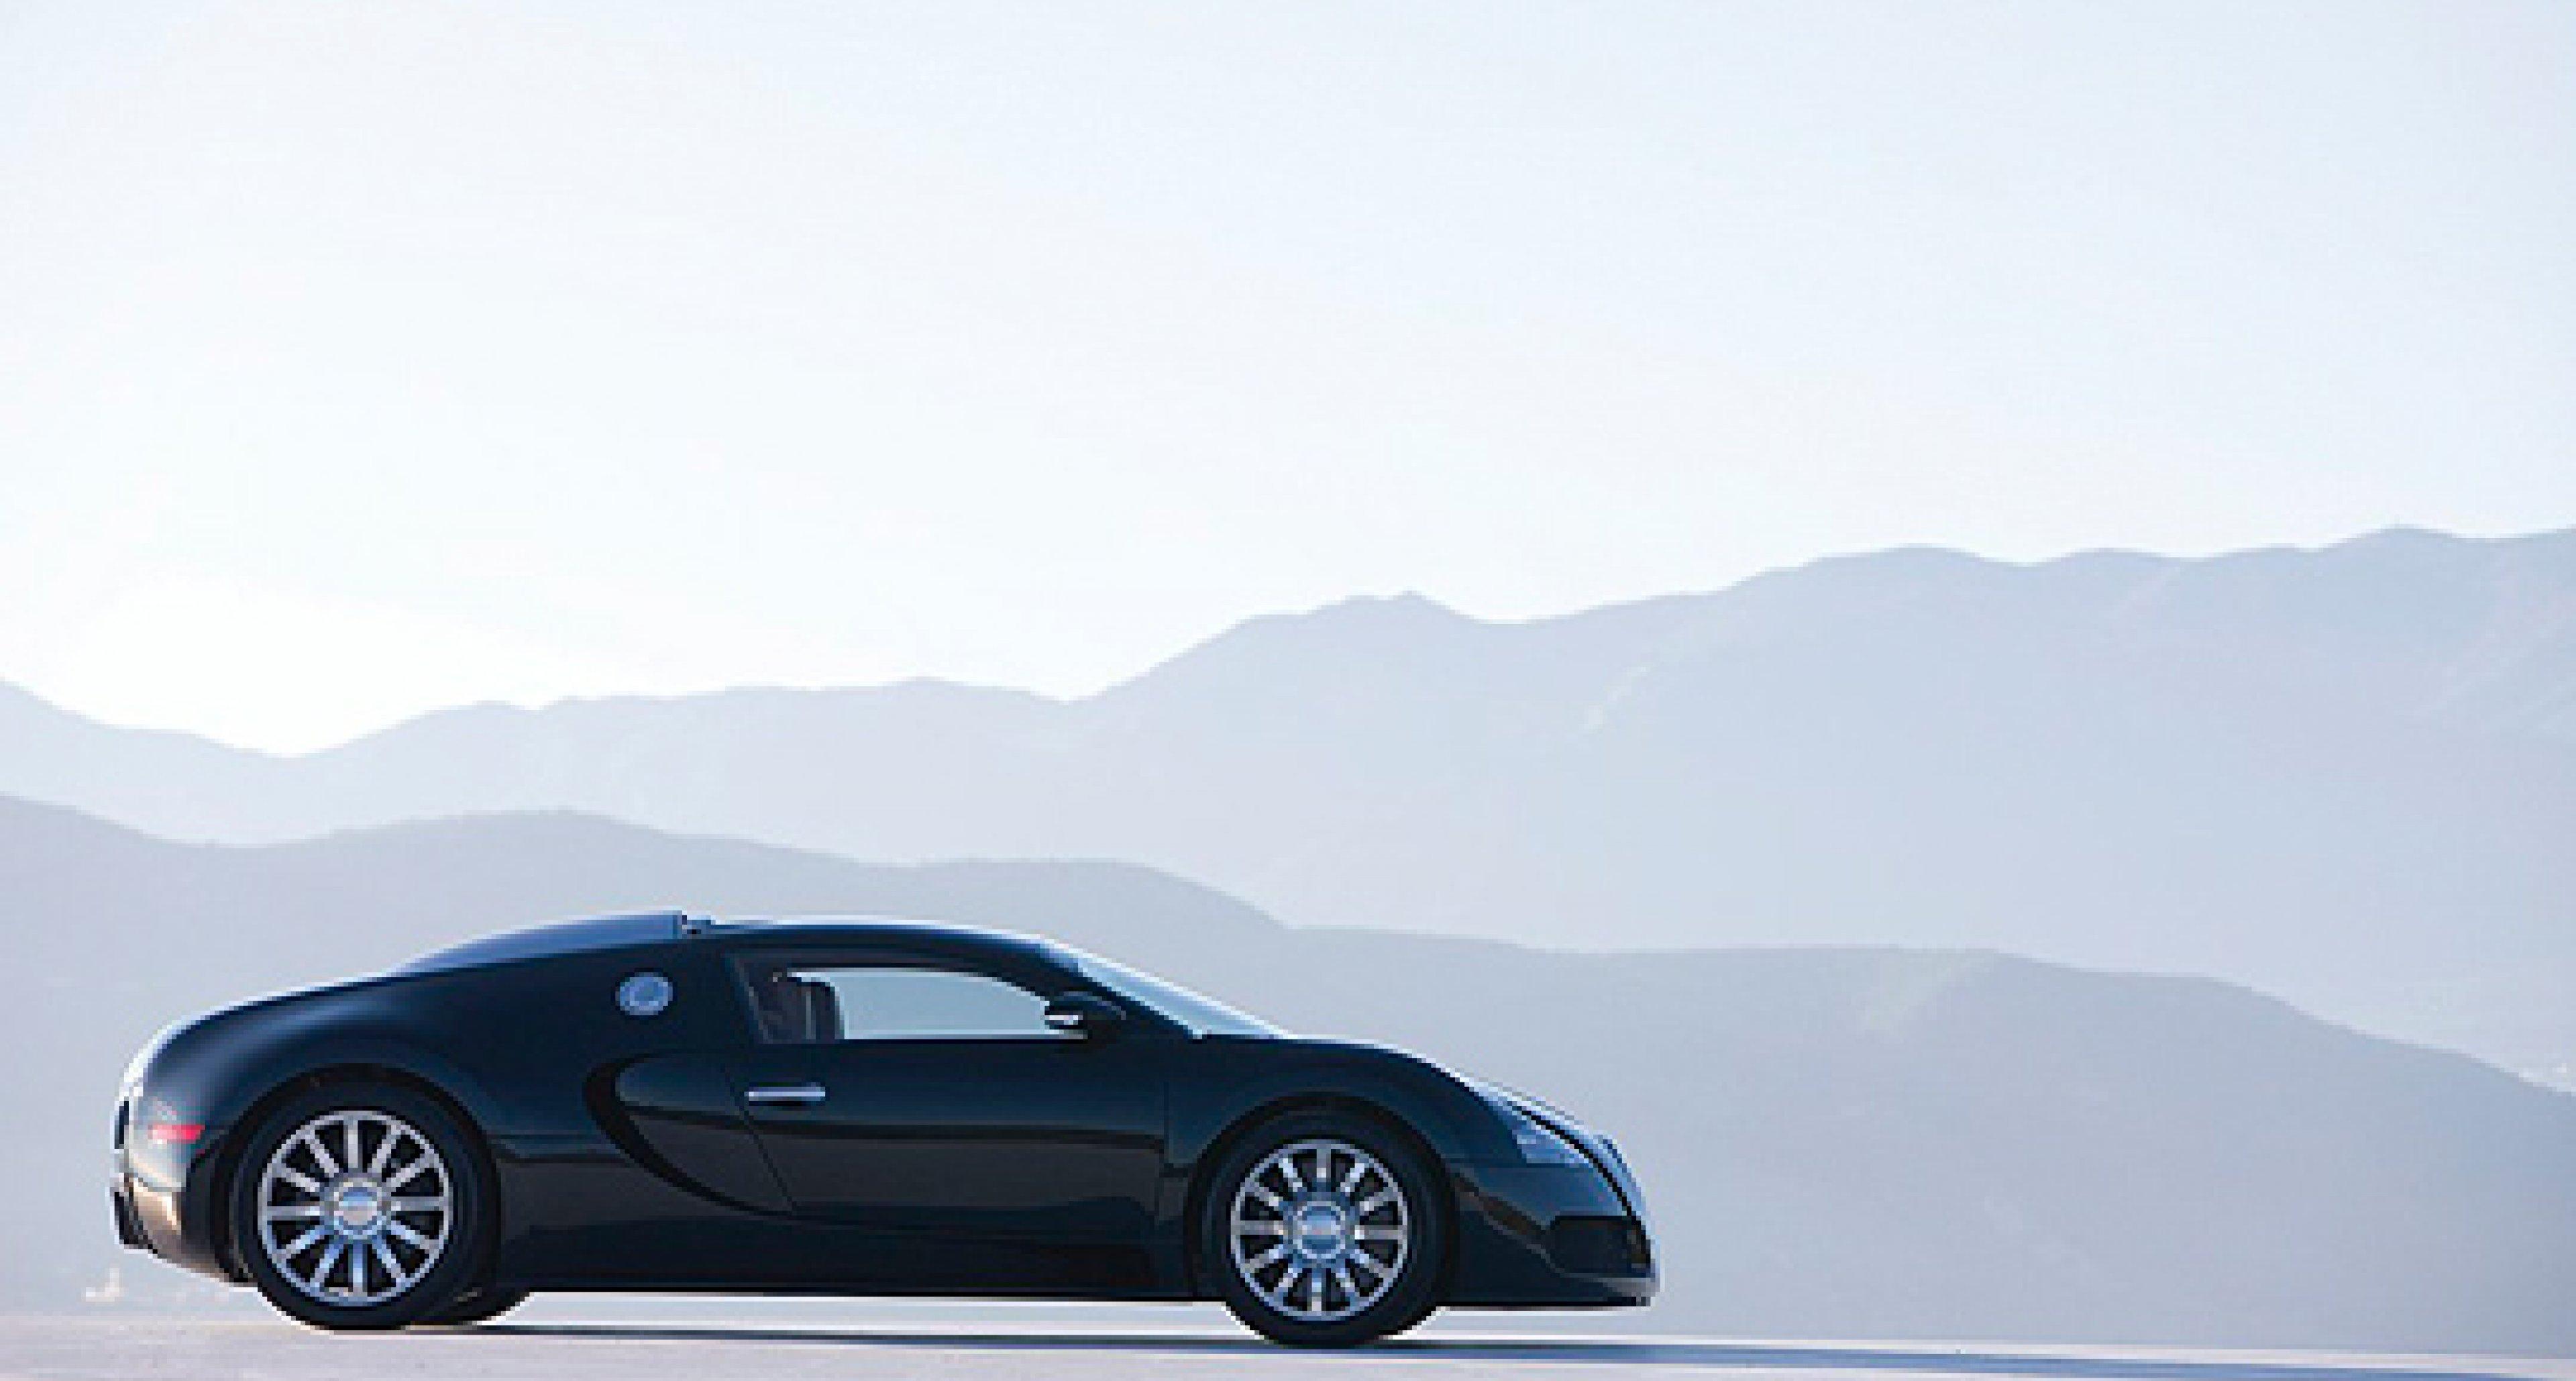 Last Bugatti Veyron 16.4 sold to a European customer